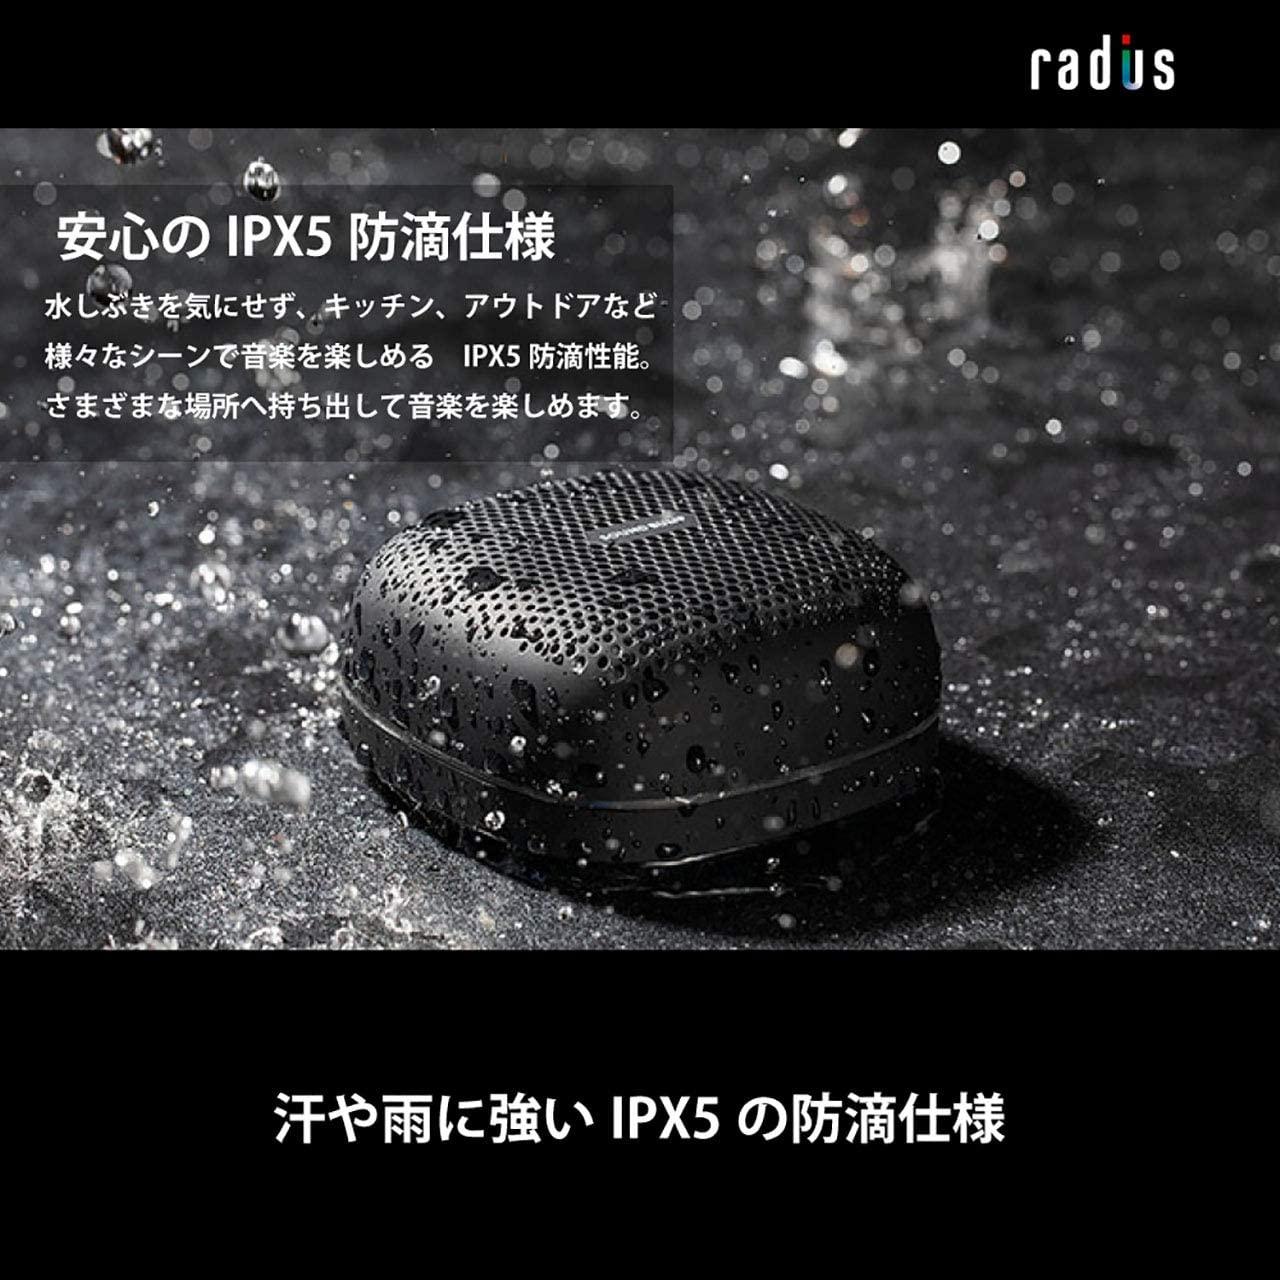 SP-S10BT ポータブルBluetoothスピーカー SOUND BUMP